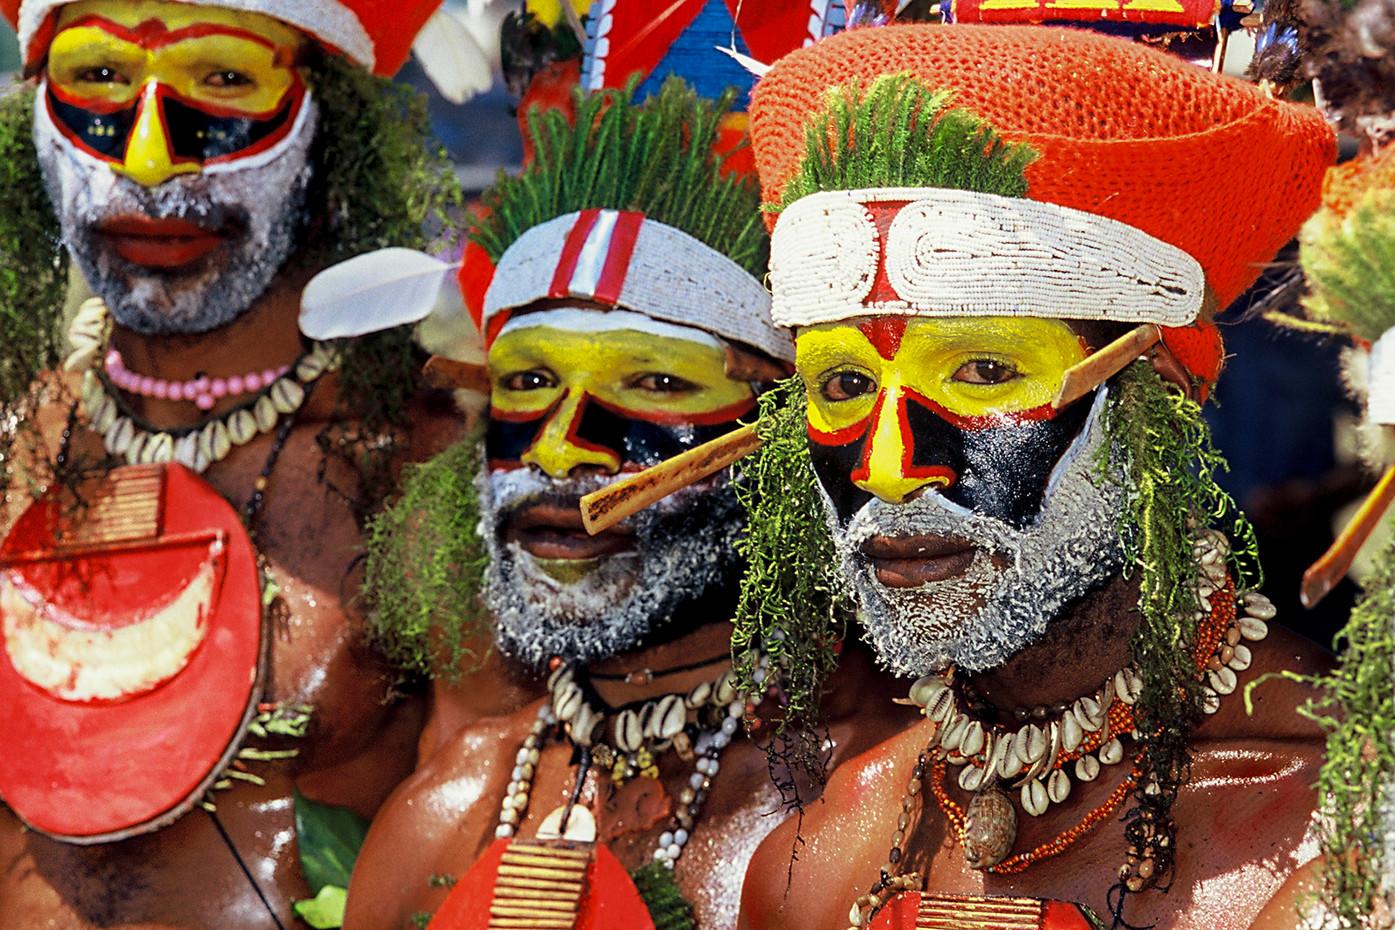 Highland Show in Goroka, Papua New Guinea